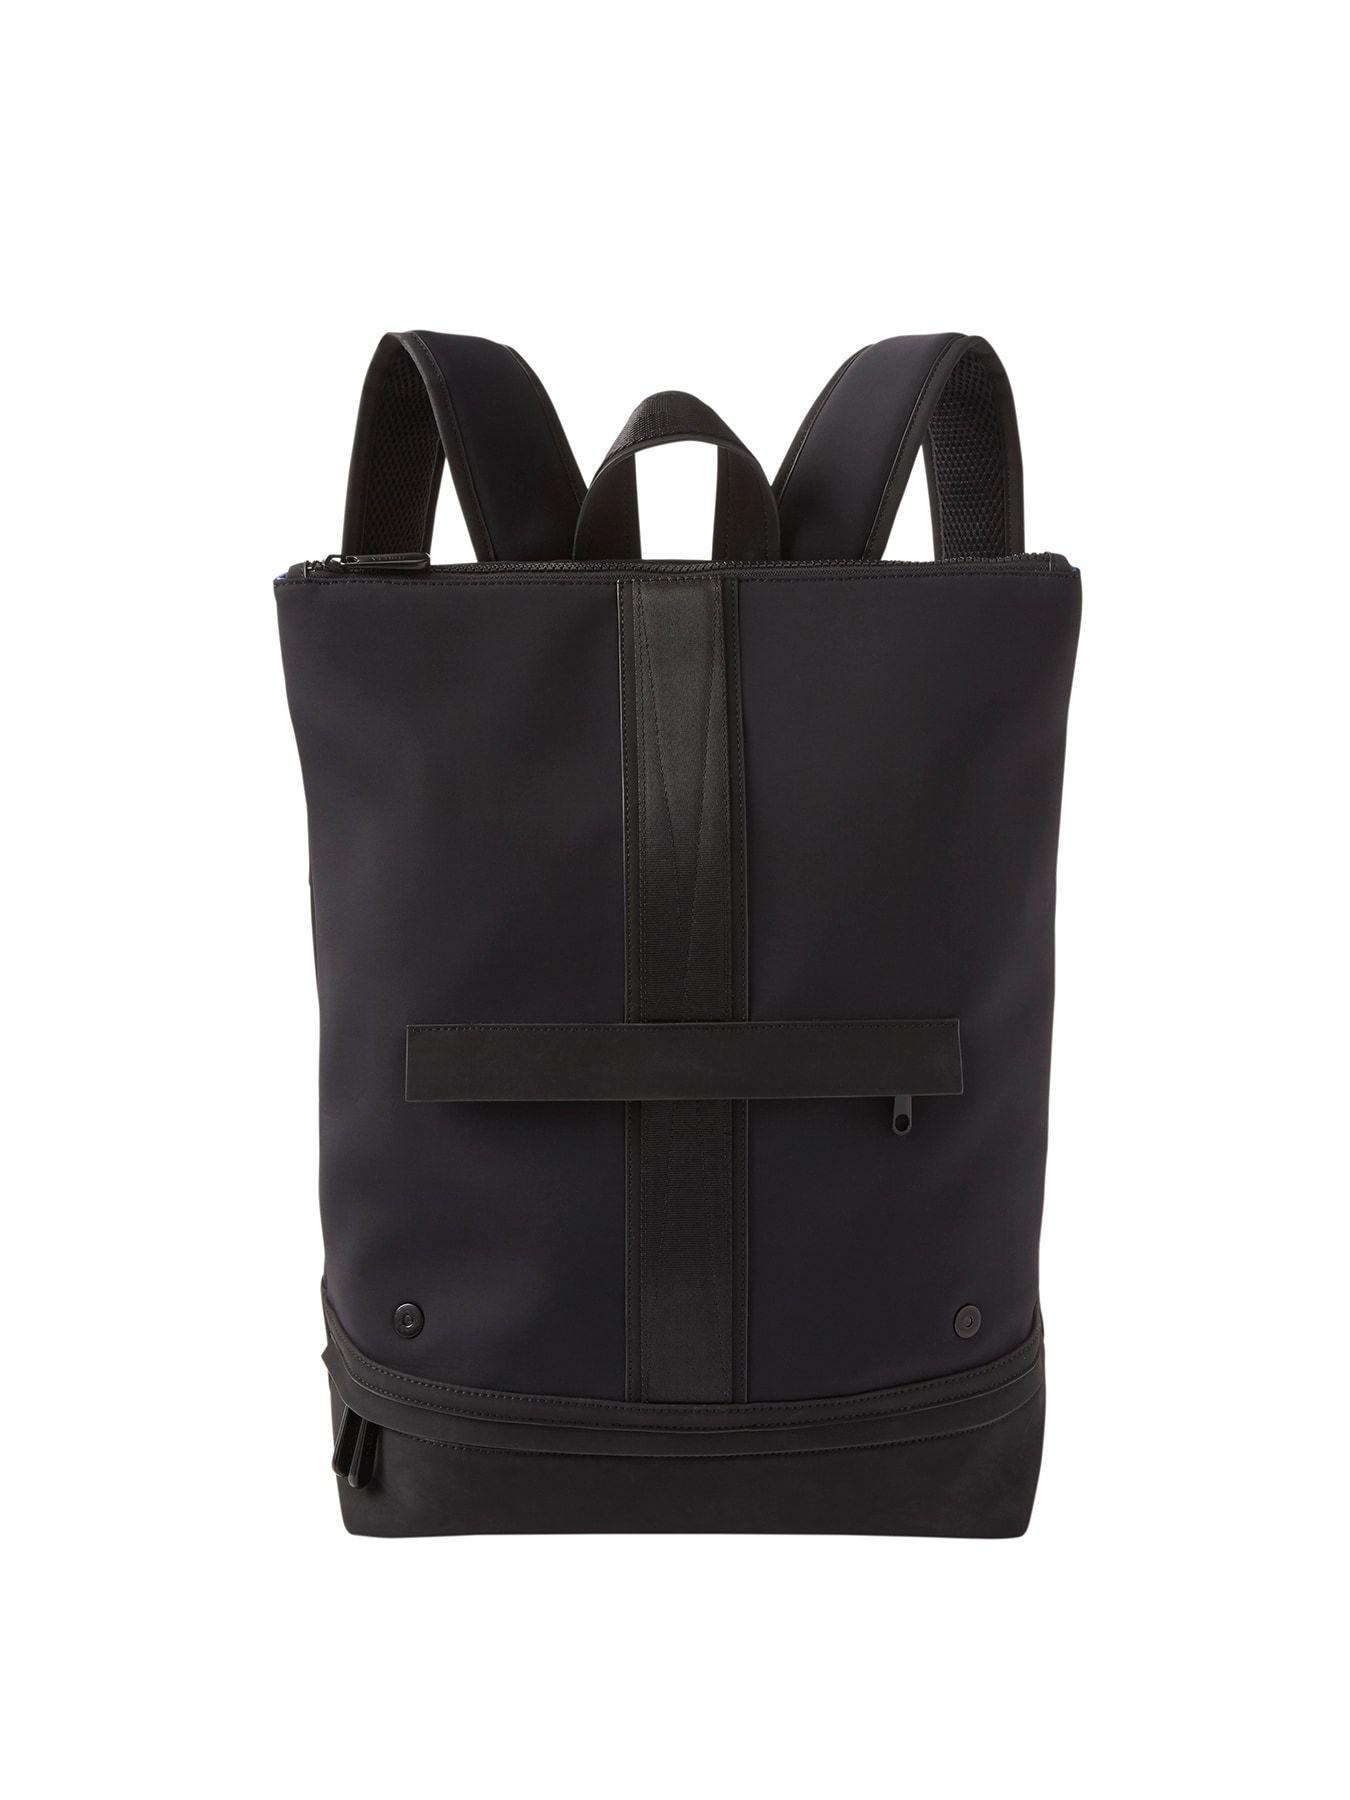 9b5b7143f5689 Caraa x Athleta Convertible Backpack